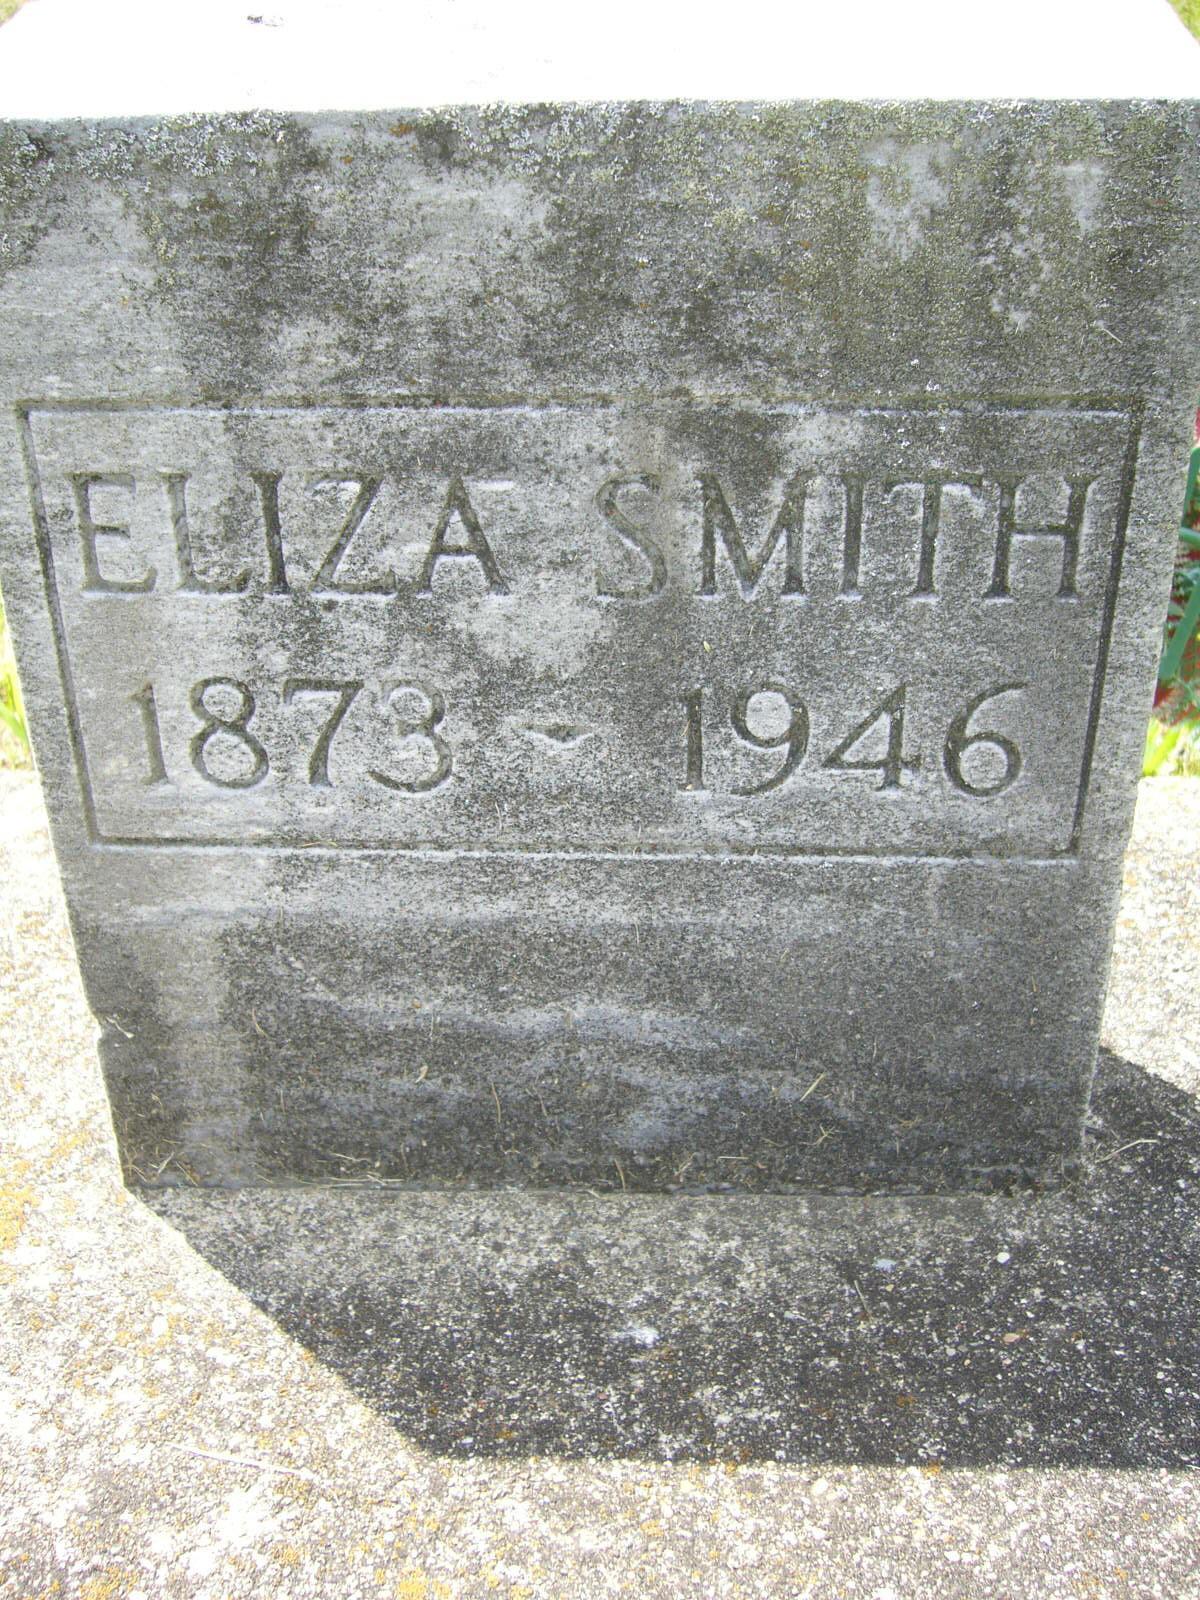 Eliza A. Smith